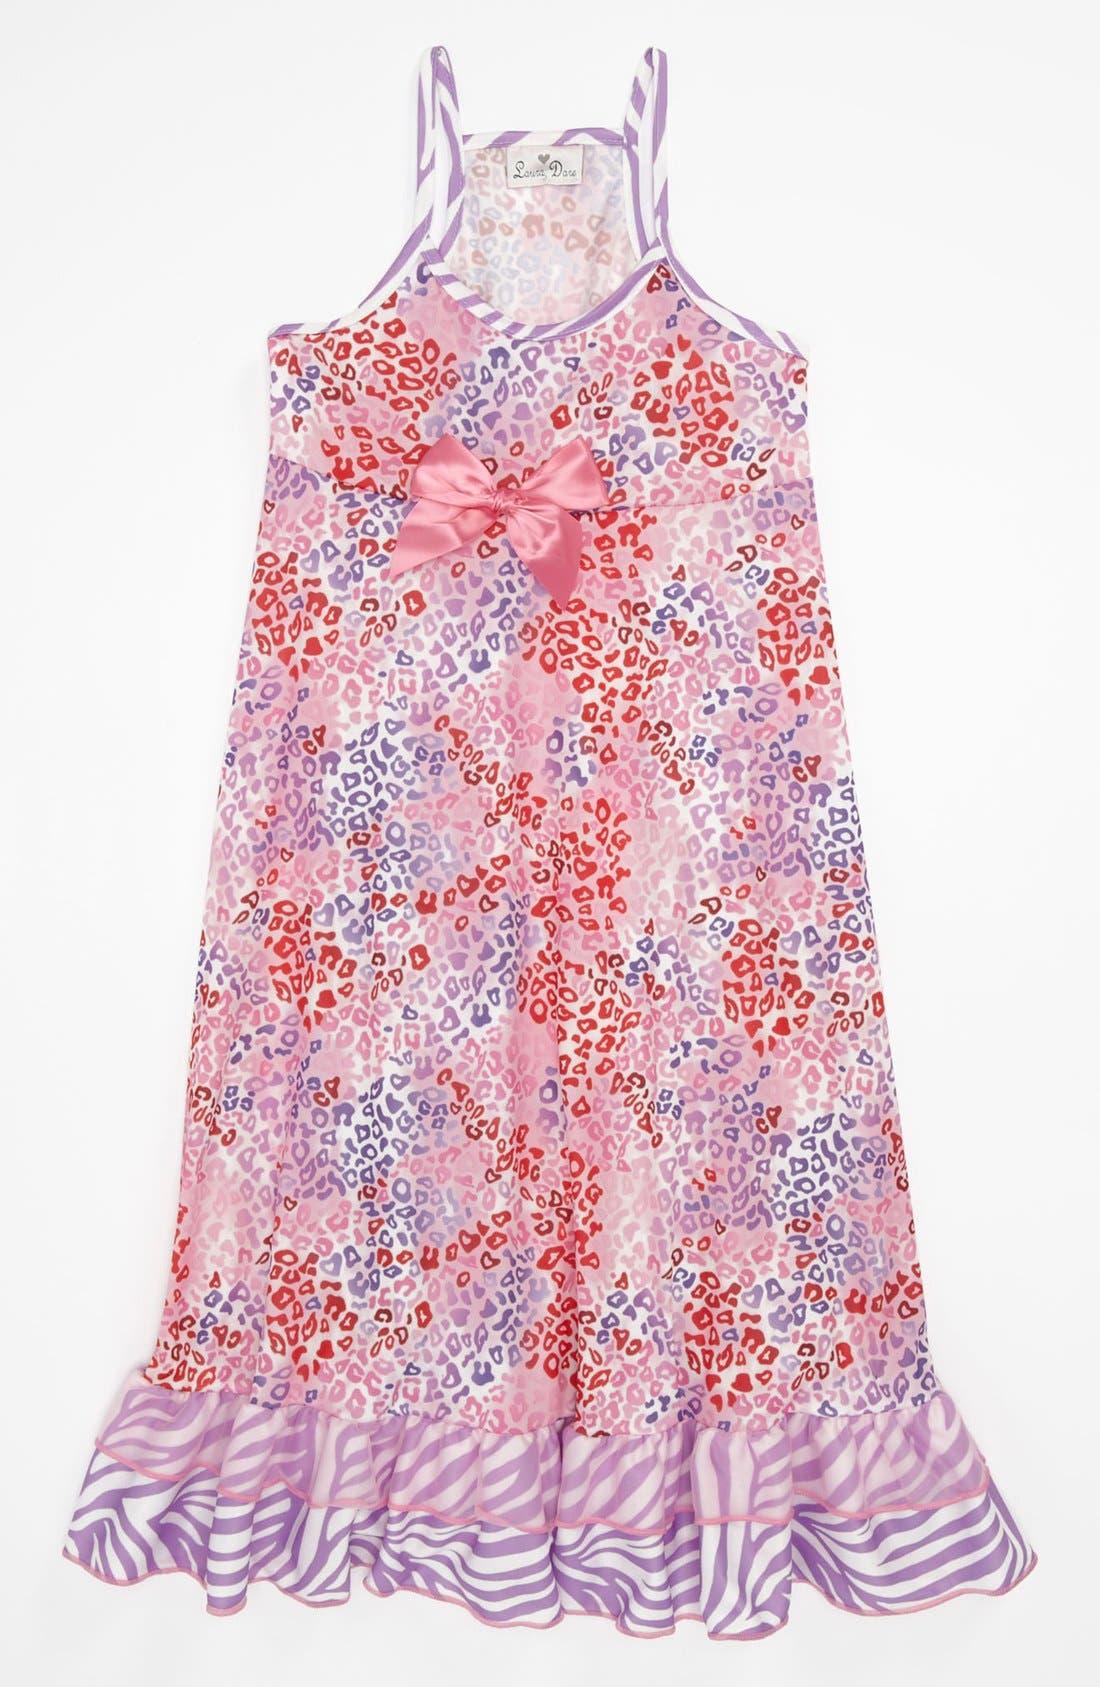 Alternate Image 1 Selected - Laura Dare 'Dream Daze' Nightgown (Little Girls & Big Girls)